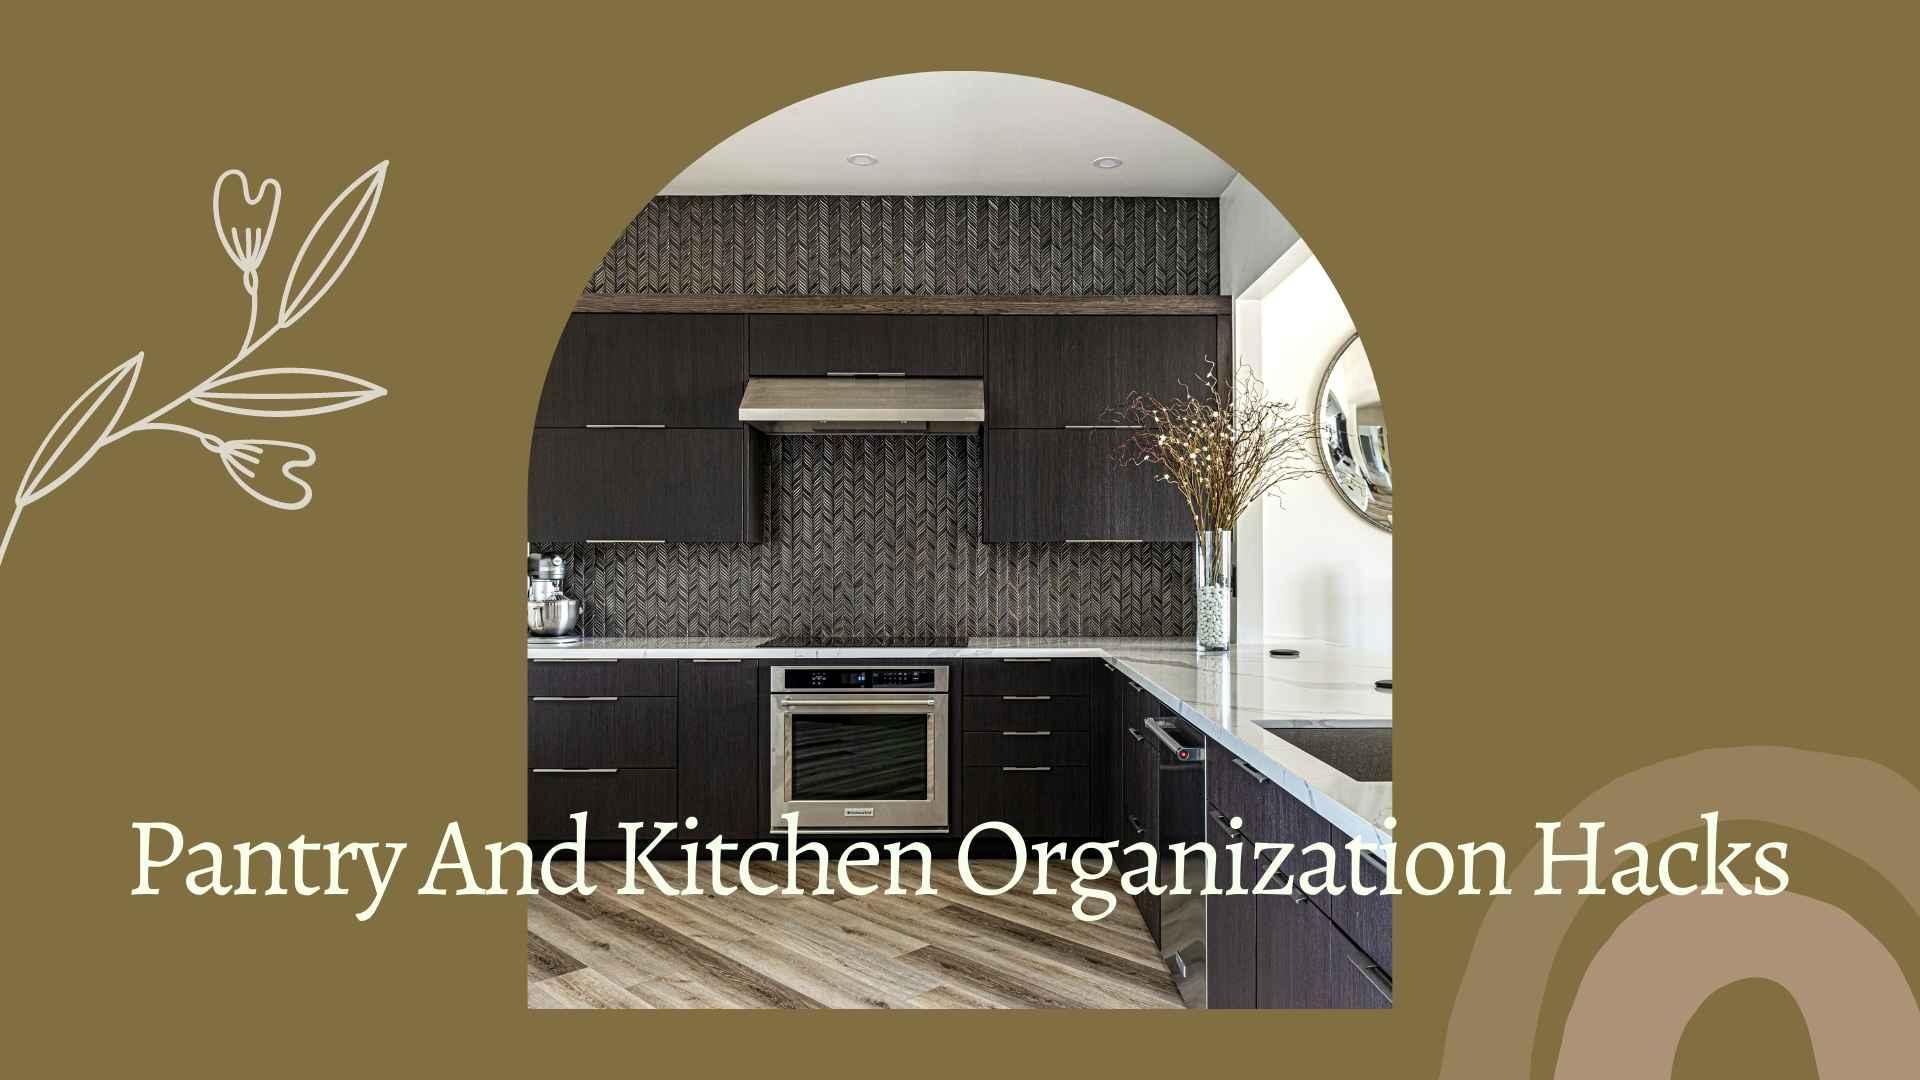 Pantry And Kitchen Organization Hacks